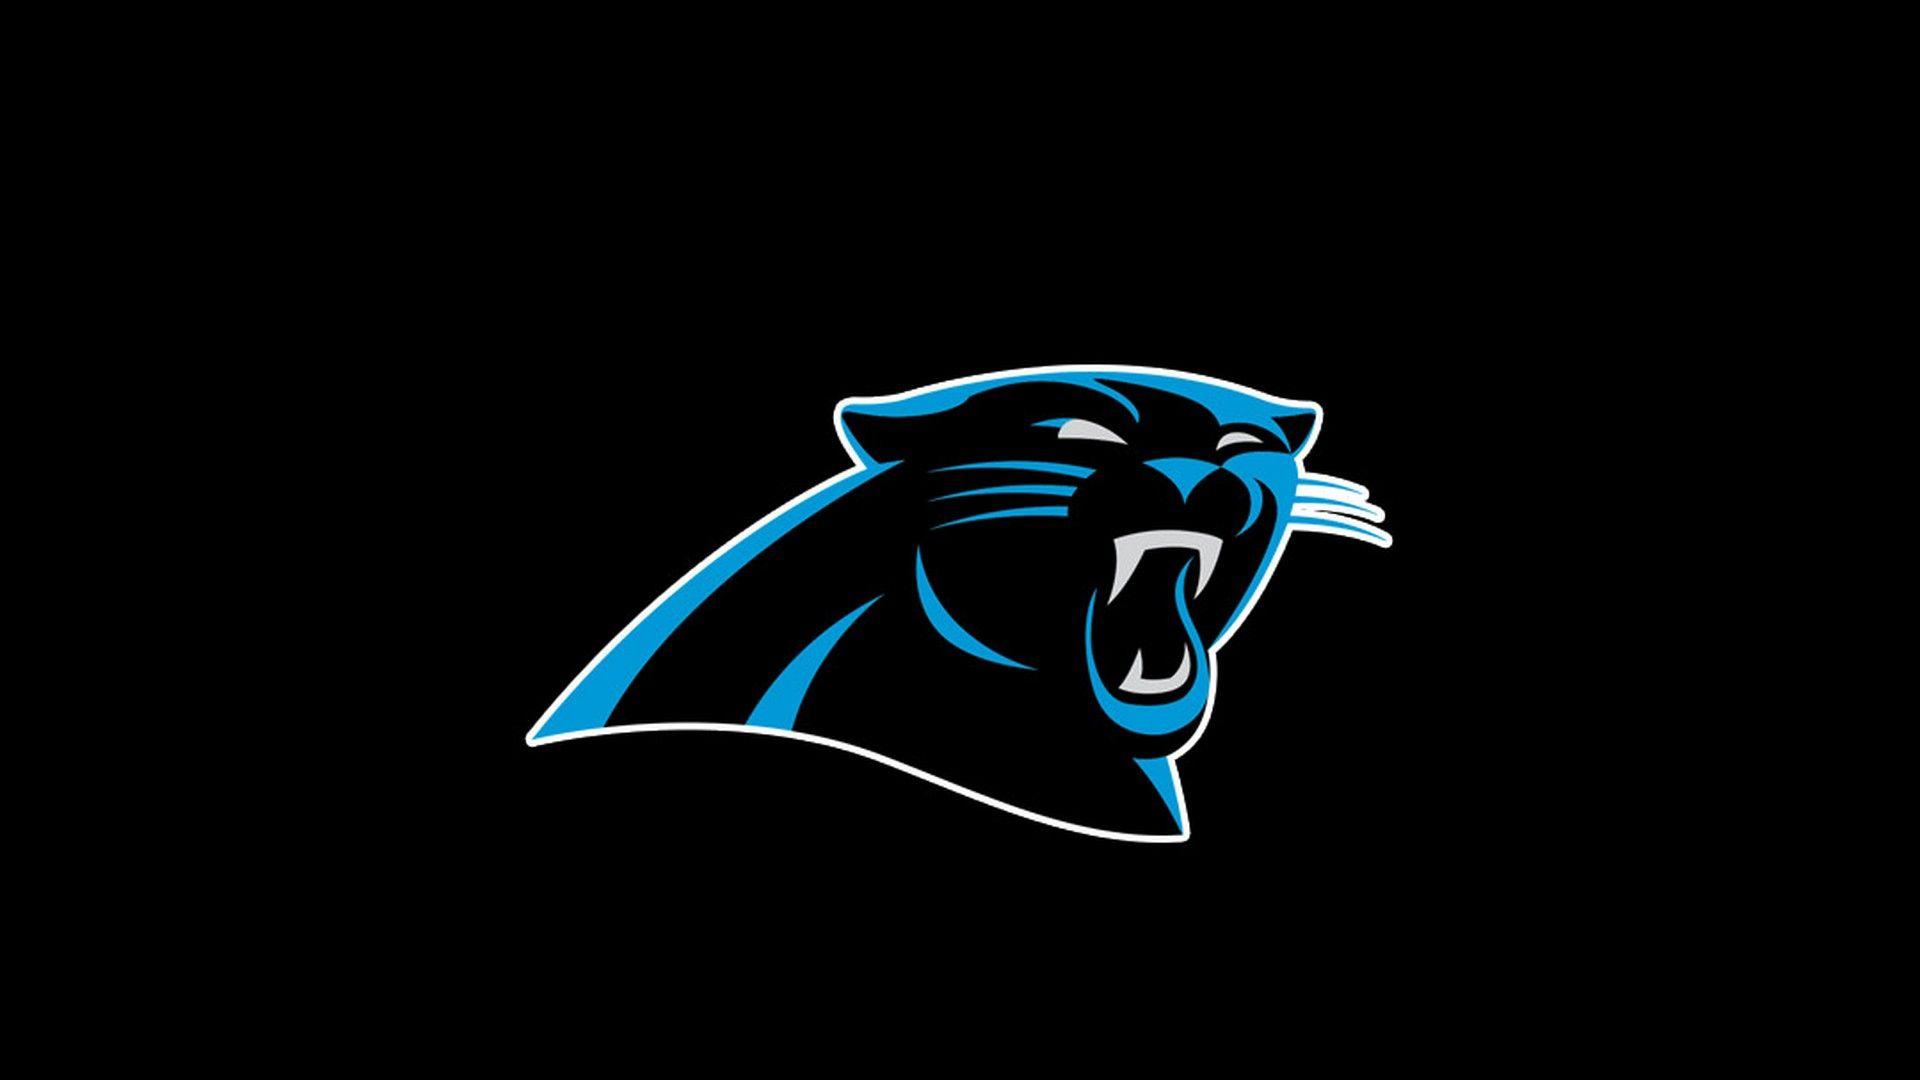 Download Panthers Desktop Wallpaper Hd Backgrounds Download